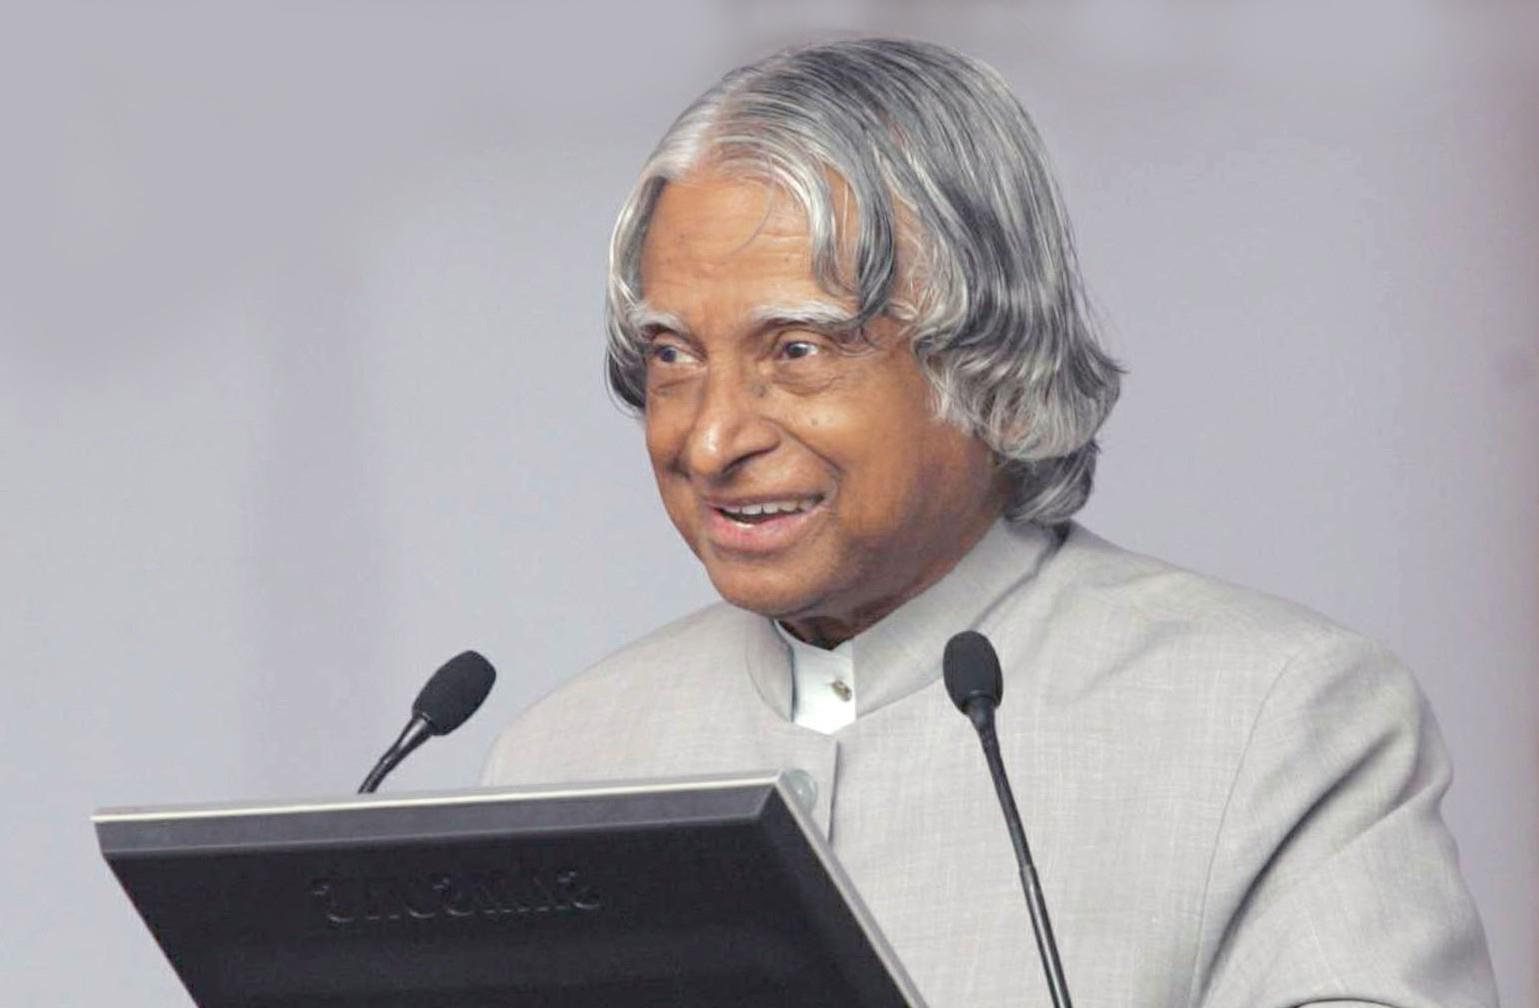 Abdul Kalam's brief address at IIT Kanpur - BHARATA MITRA